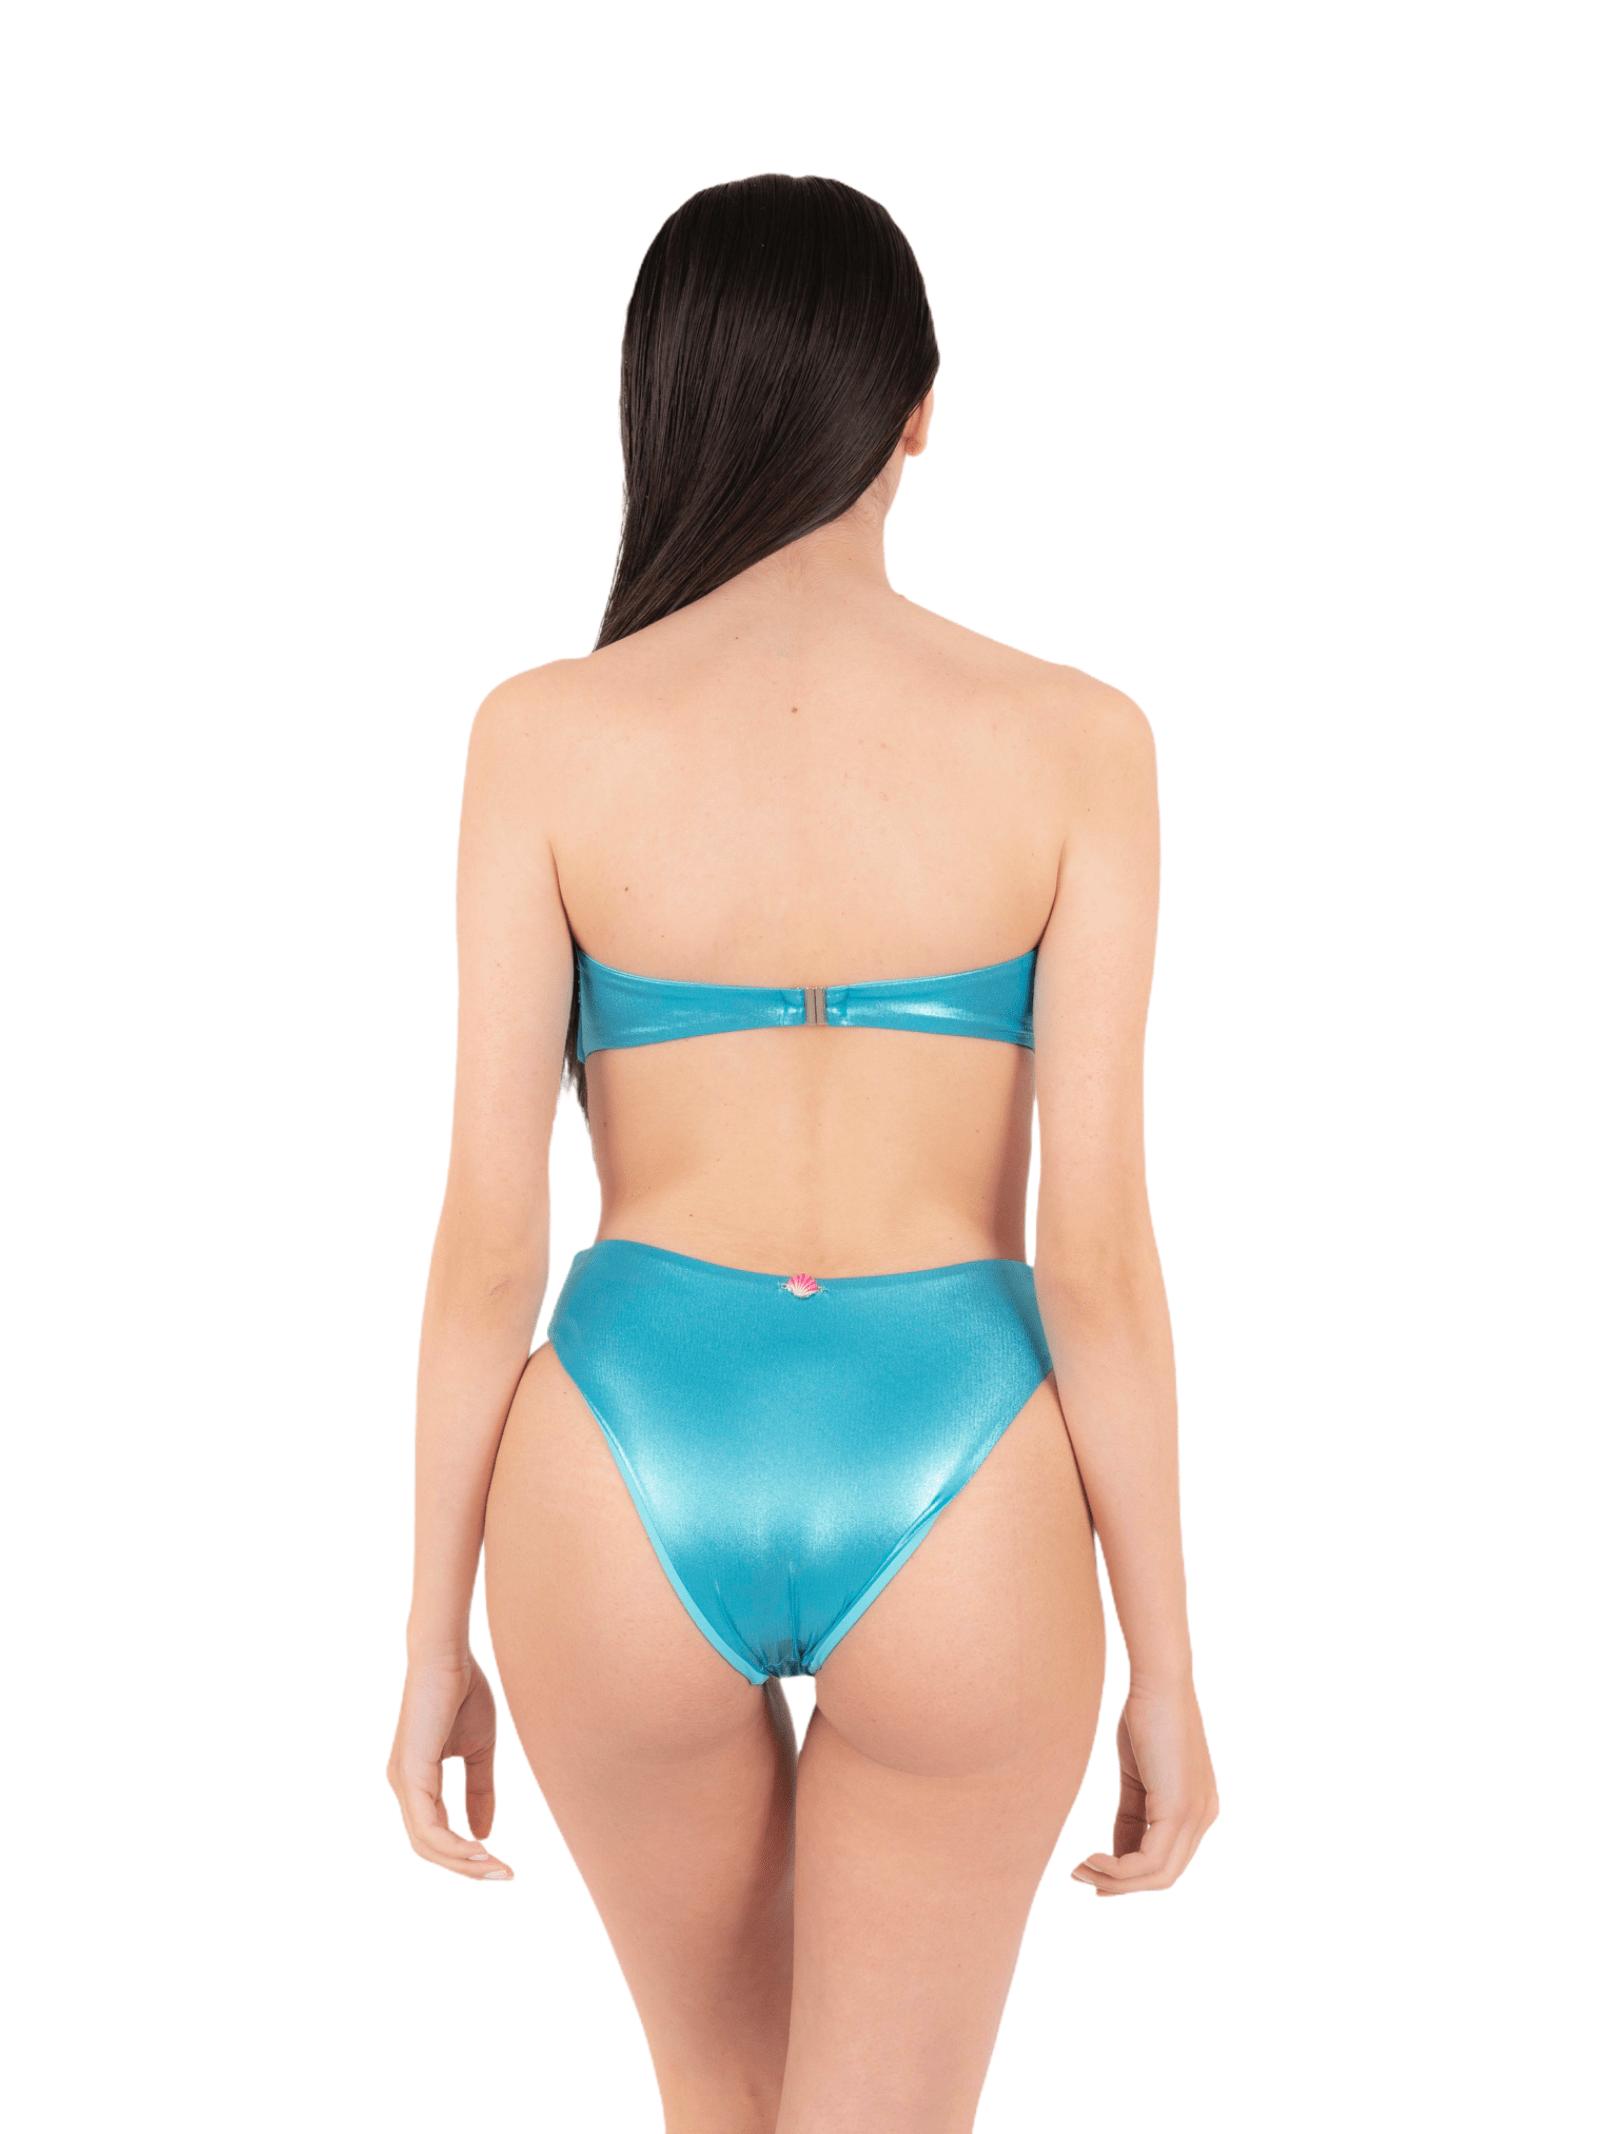 Bikini top with high slip ANNAMARE | 23 | BK-128CELESTE